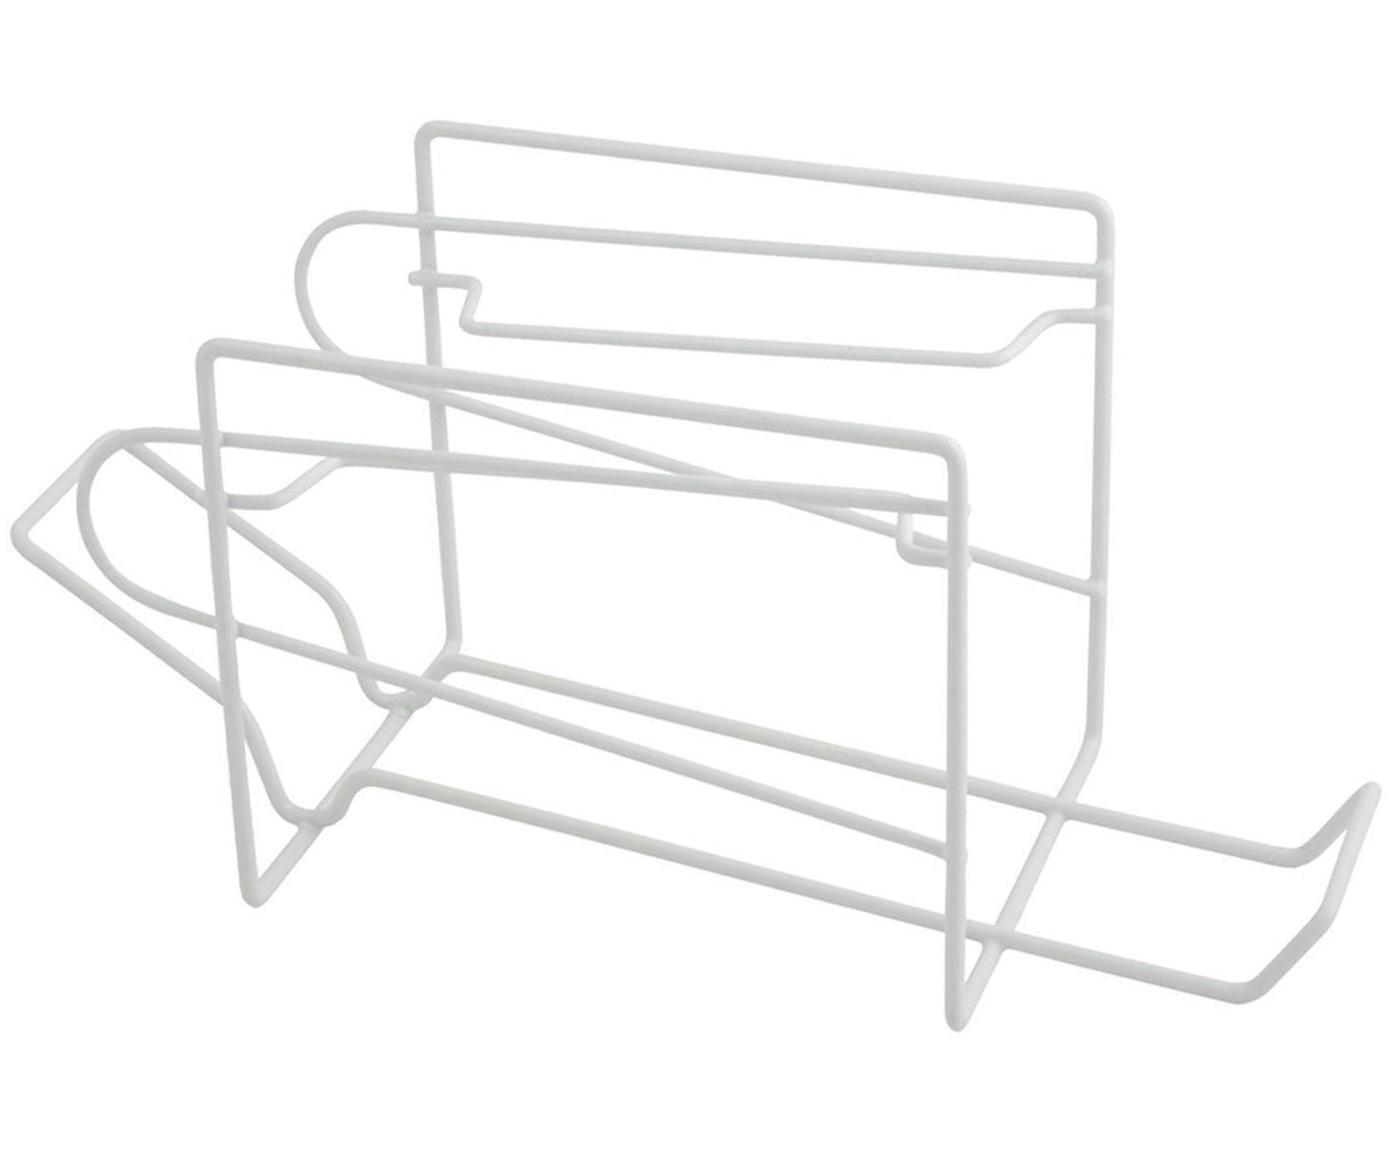 Organizador de latas Fresco, Metal recubierto, Blanco, An 33 x Al 15 cm